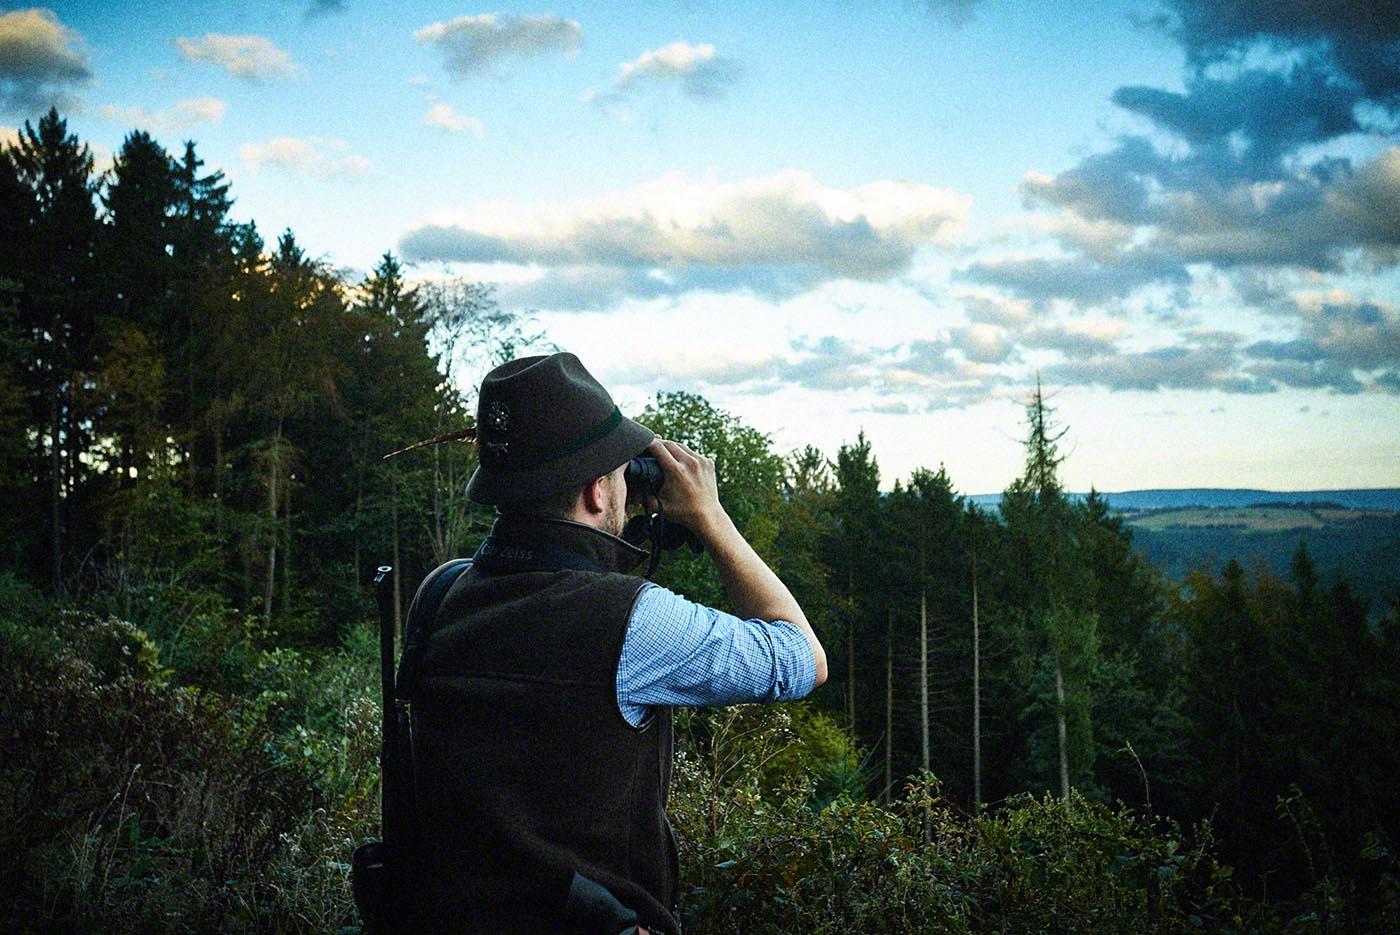 Jäger blickt durchs Fernglas - Jagd-Reportage mit Sternekoch Harald und Maximilian Rüssel Fotos: neon fotografie